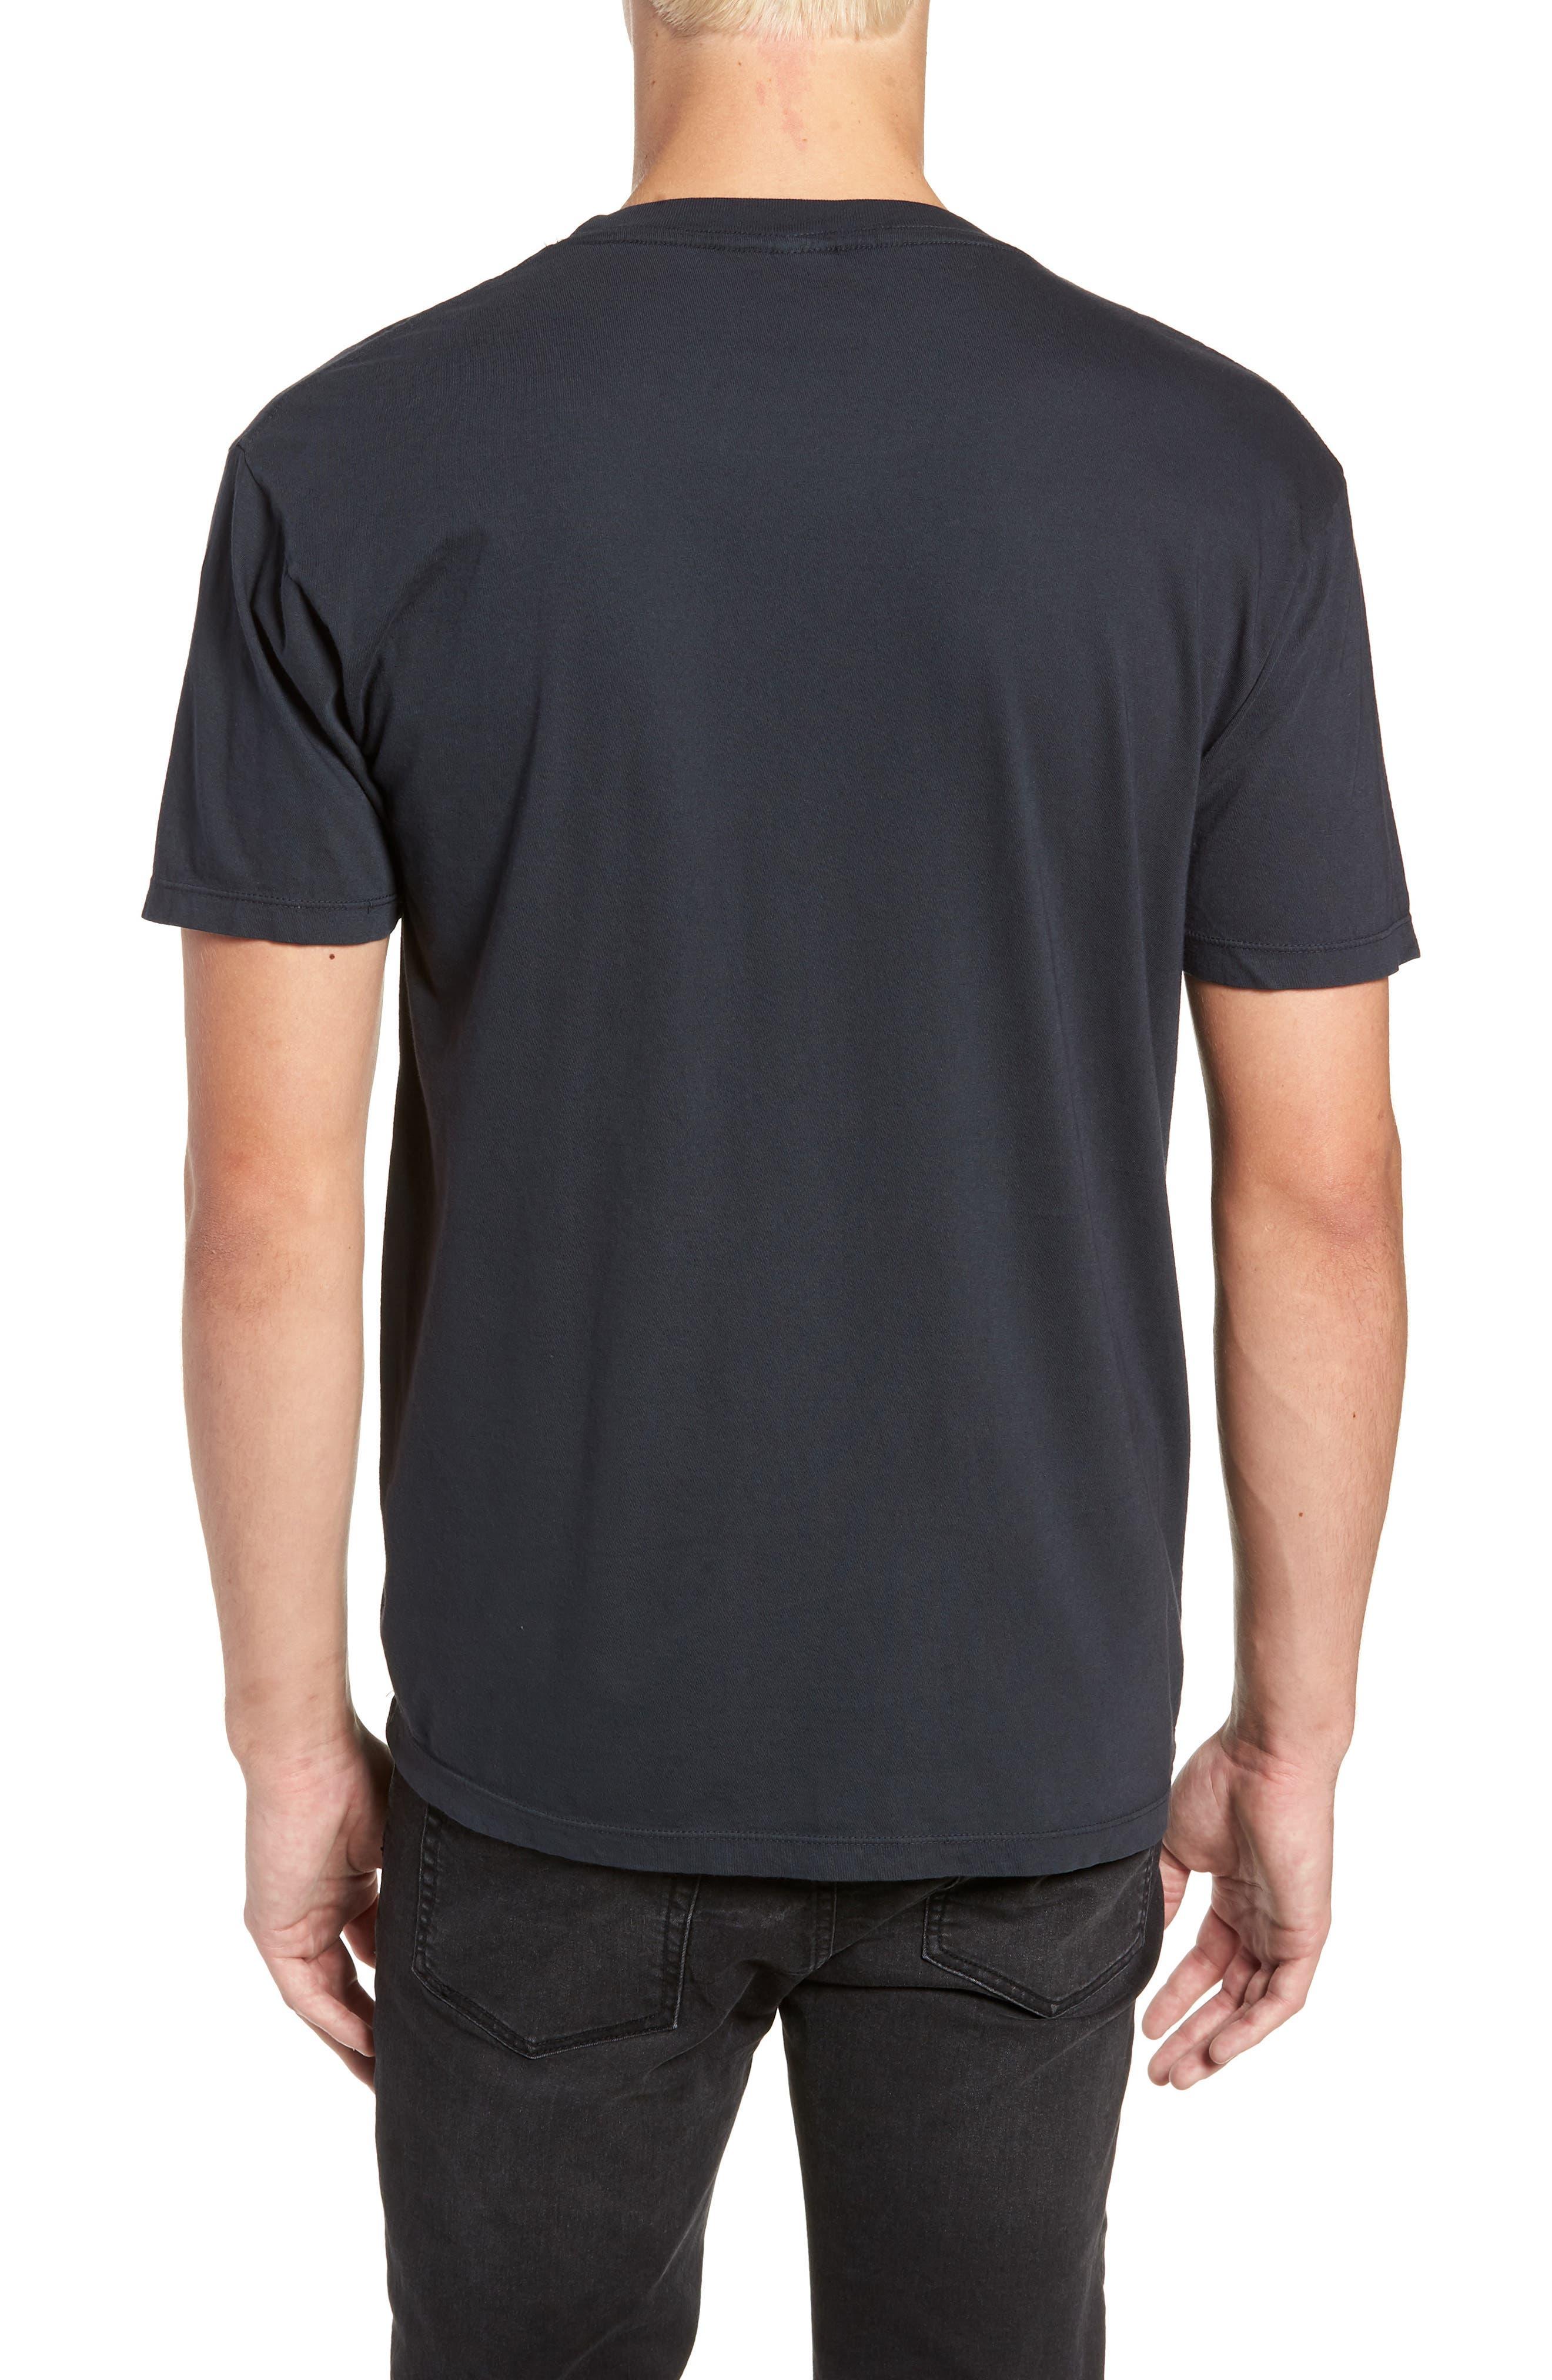 Motion Graphic T-Shirt,                             Alternate thumbnail 2, color,                             BLACK